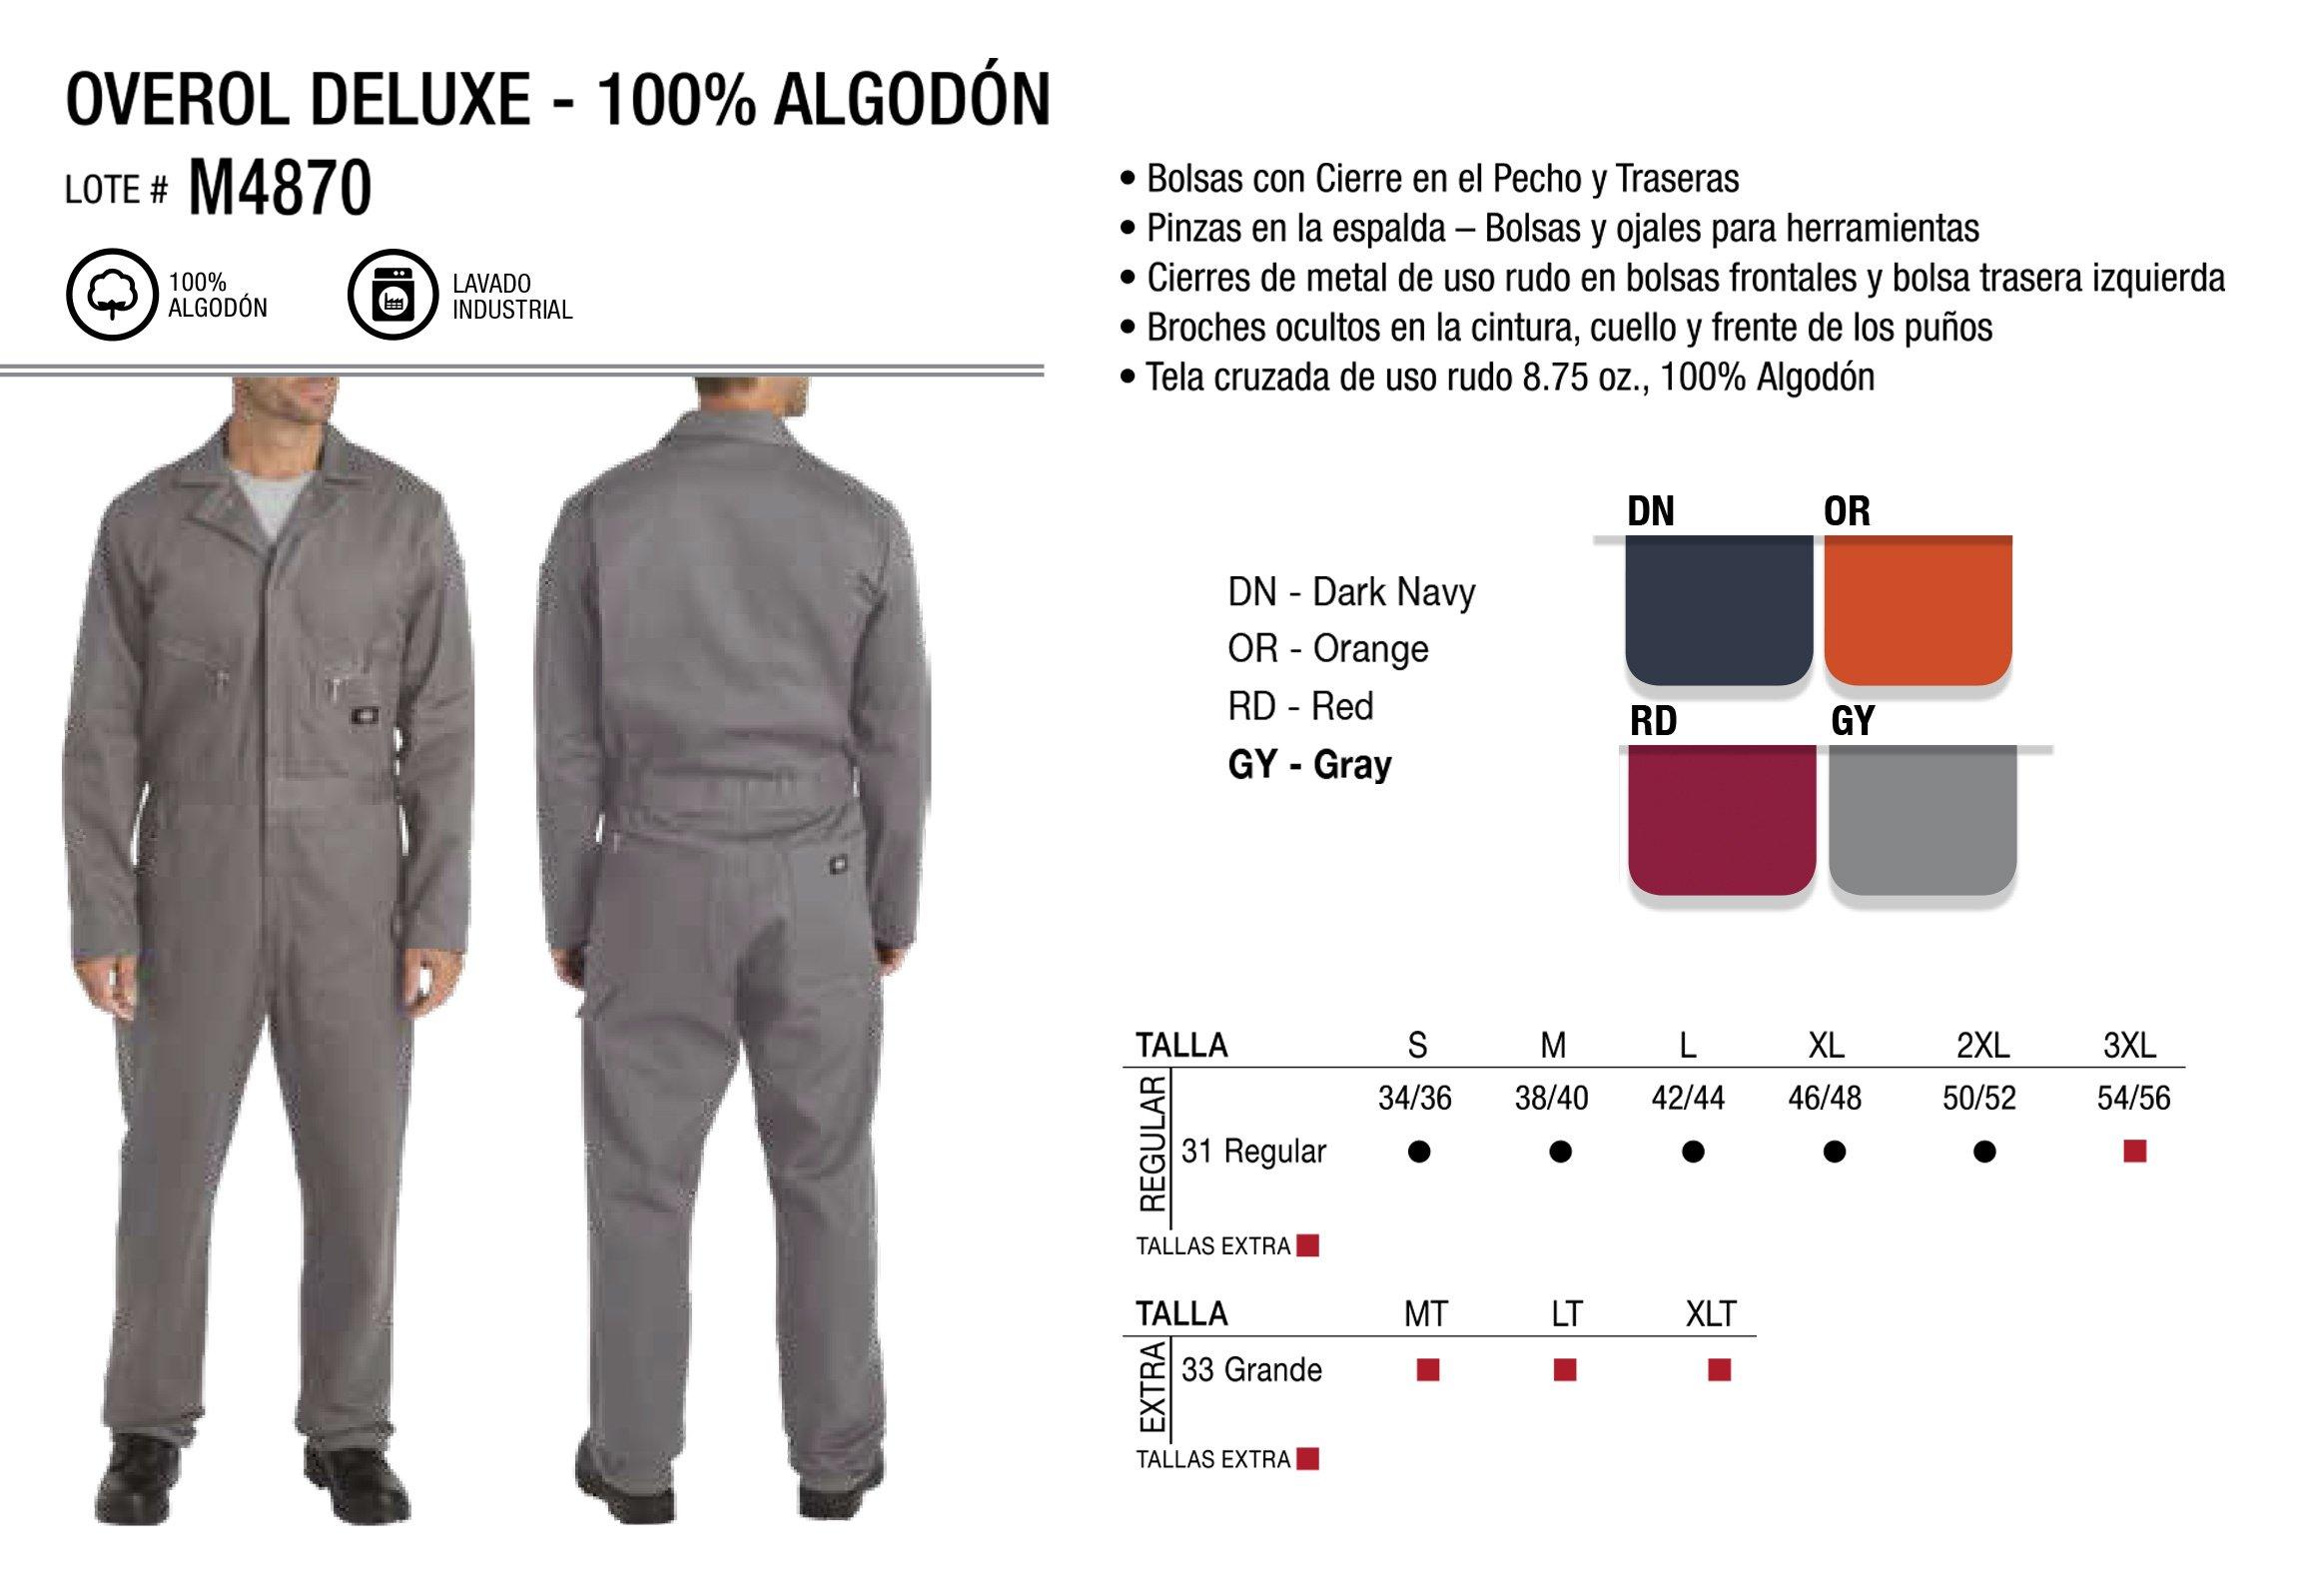 Overol Deluxe 100% Algodón. Manga Larga. M4870.